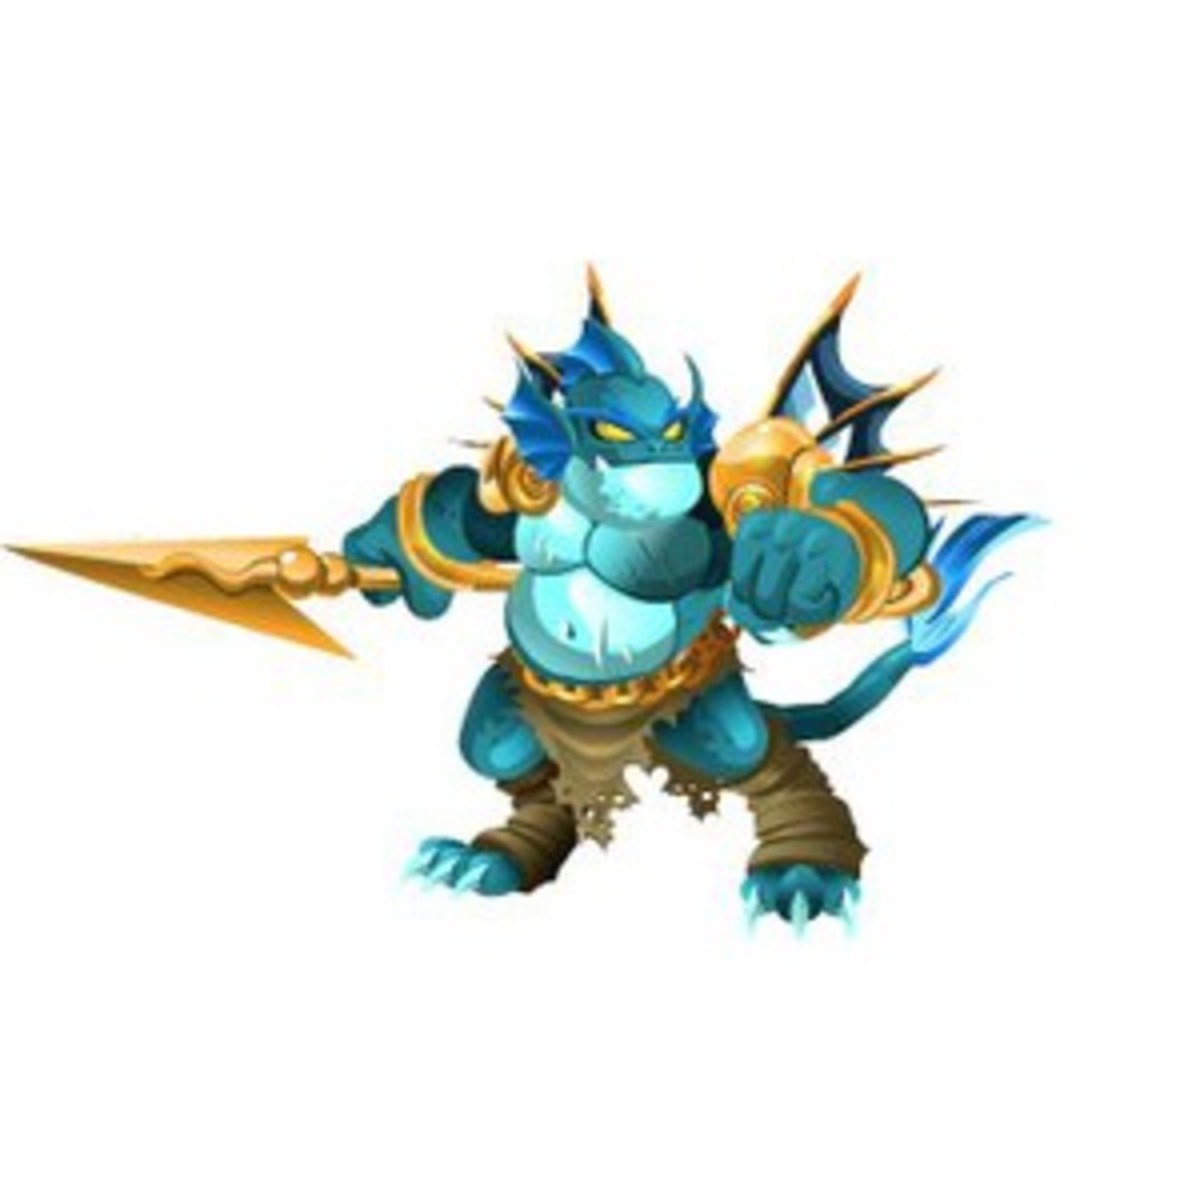 monster-legends-in-depth-legendary-guide-lord-of-the-atlantis